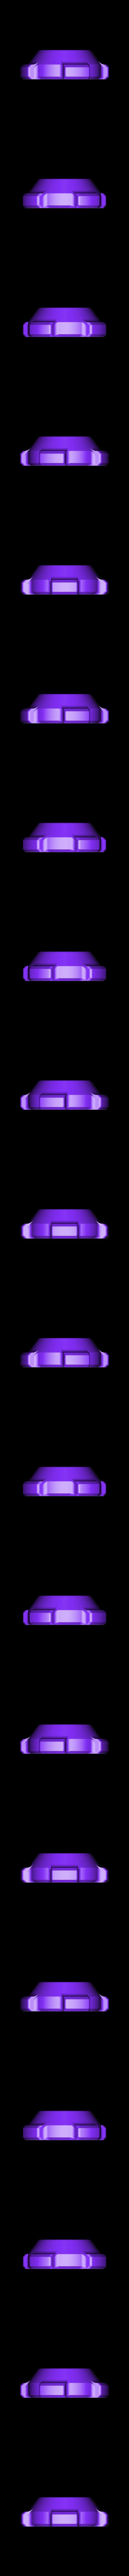 AnetE10_Xtensioner_Knob.STL Download free STL file Anet E10: Y belt tensioner • Object to 3D print, MrCrankyface